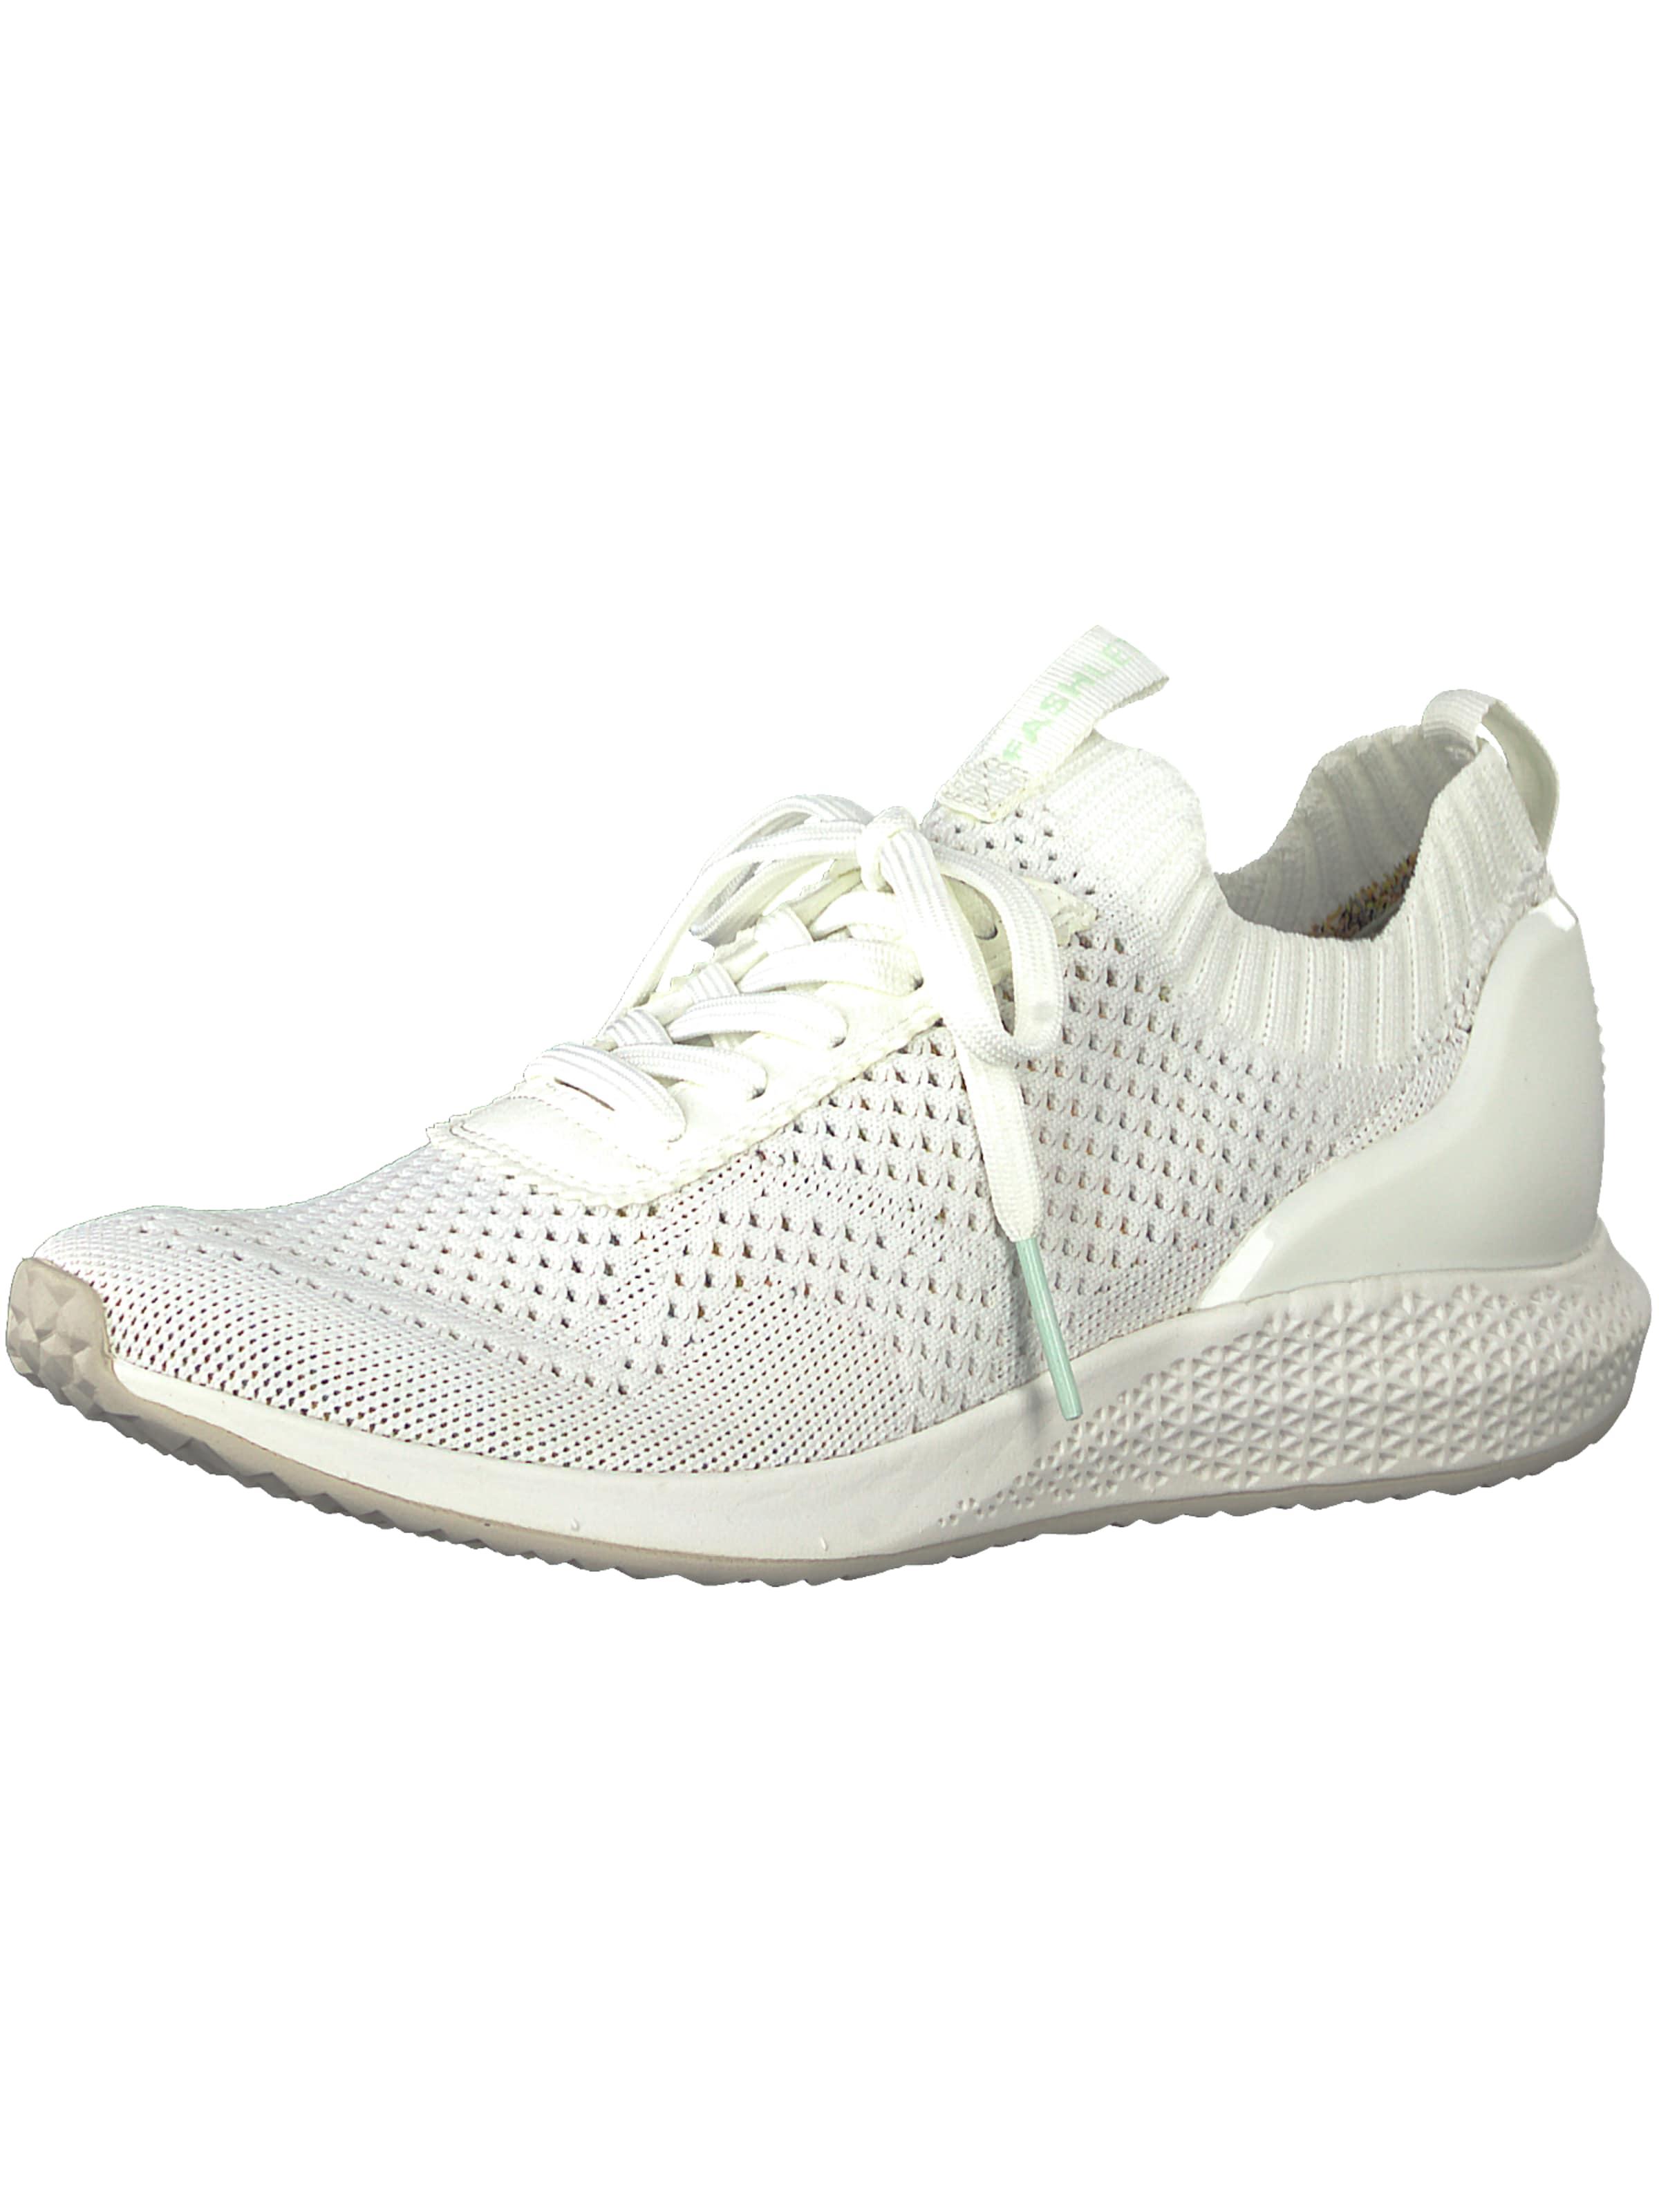 Blanc Basses 'fashletics' En Tamaris Baskets H2Y9WEDI